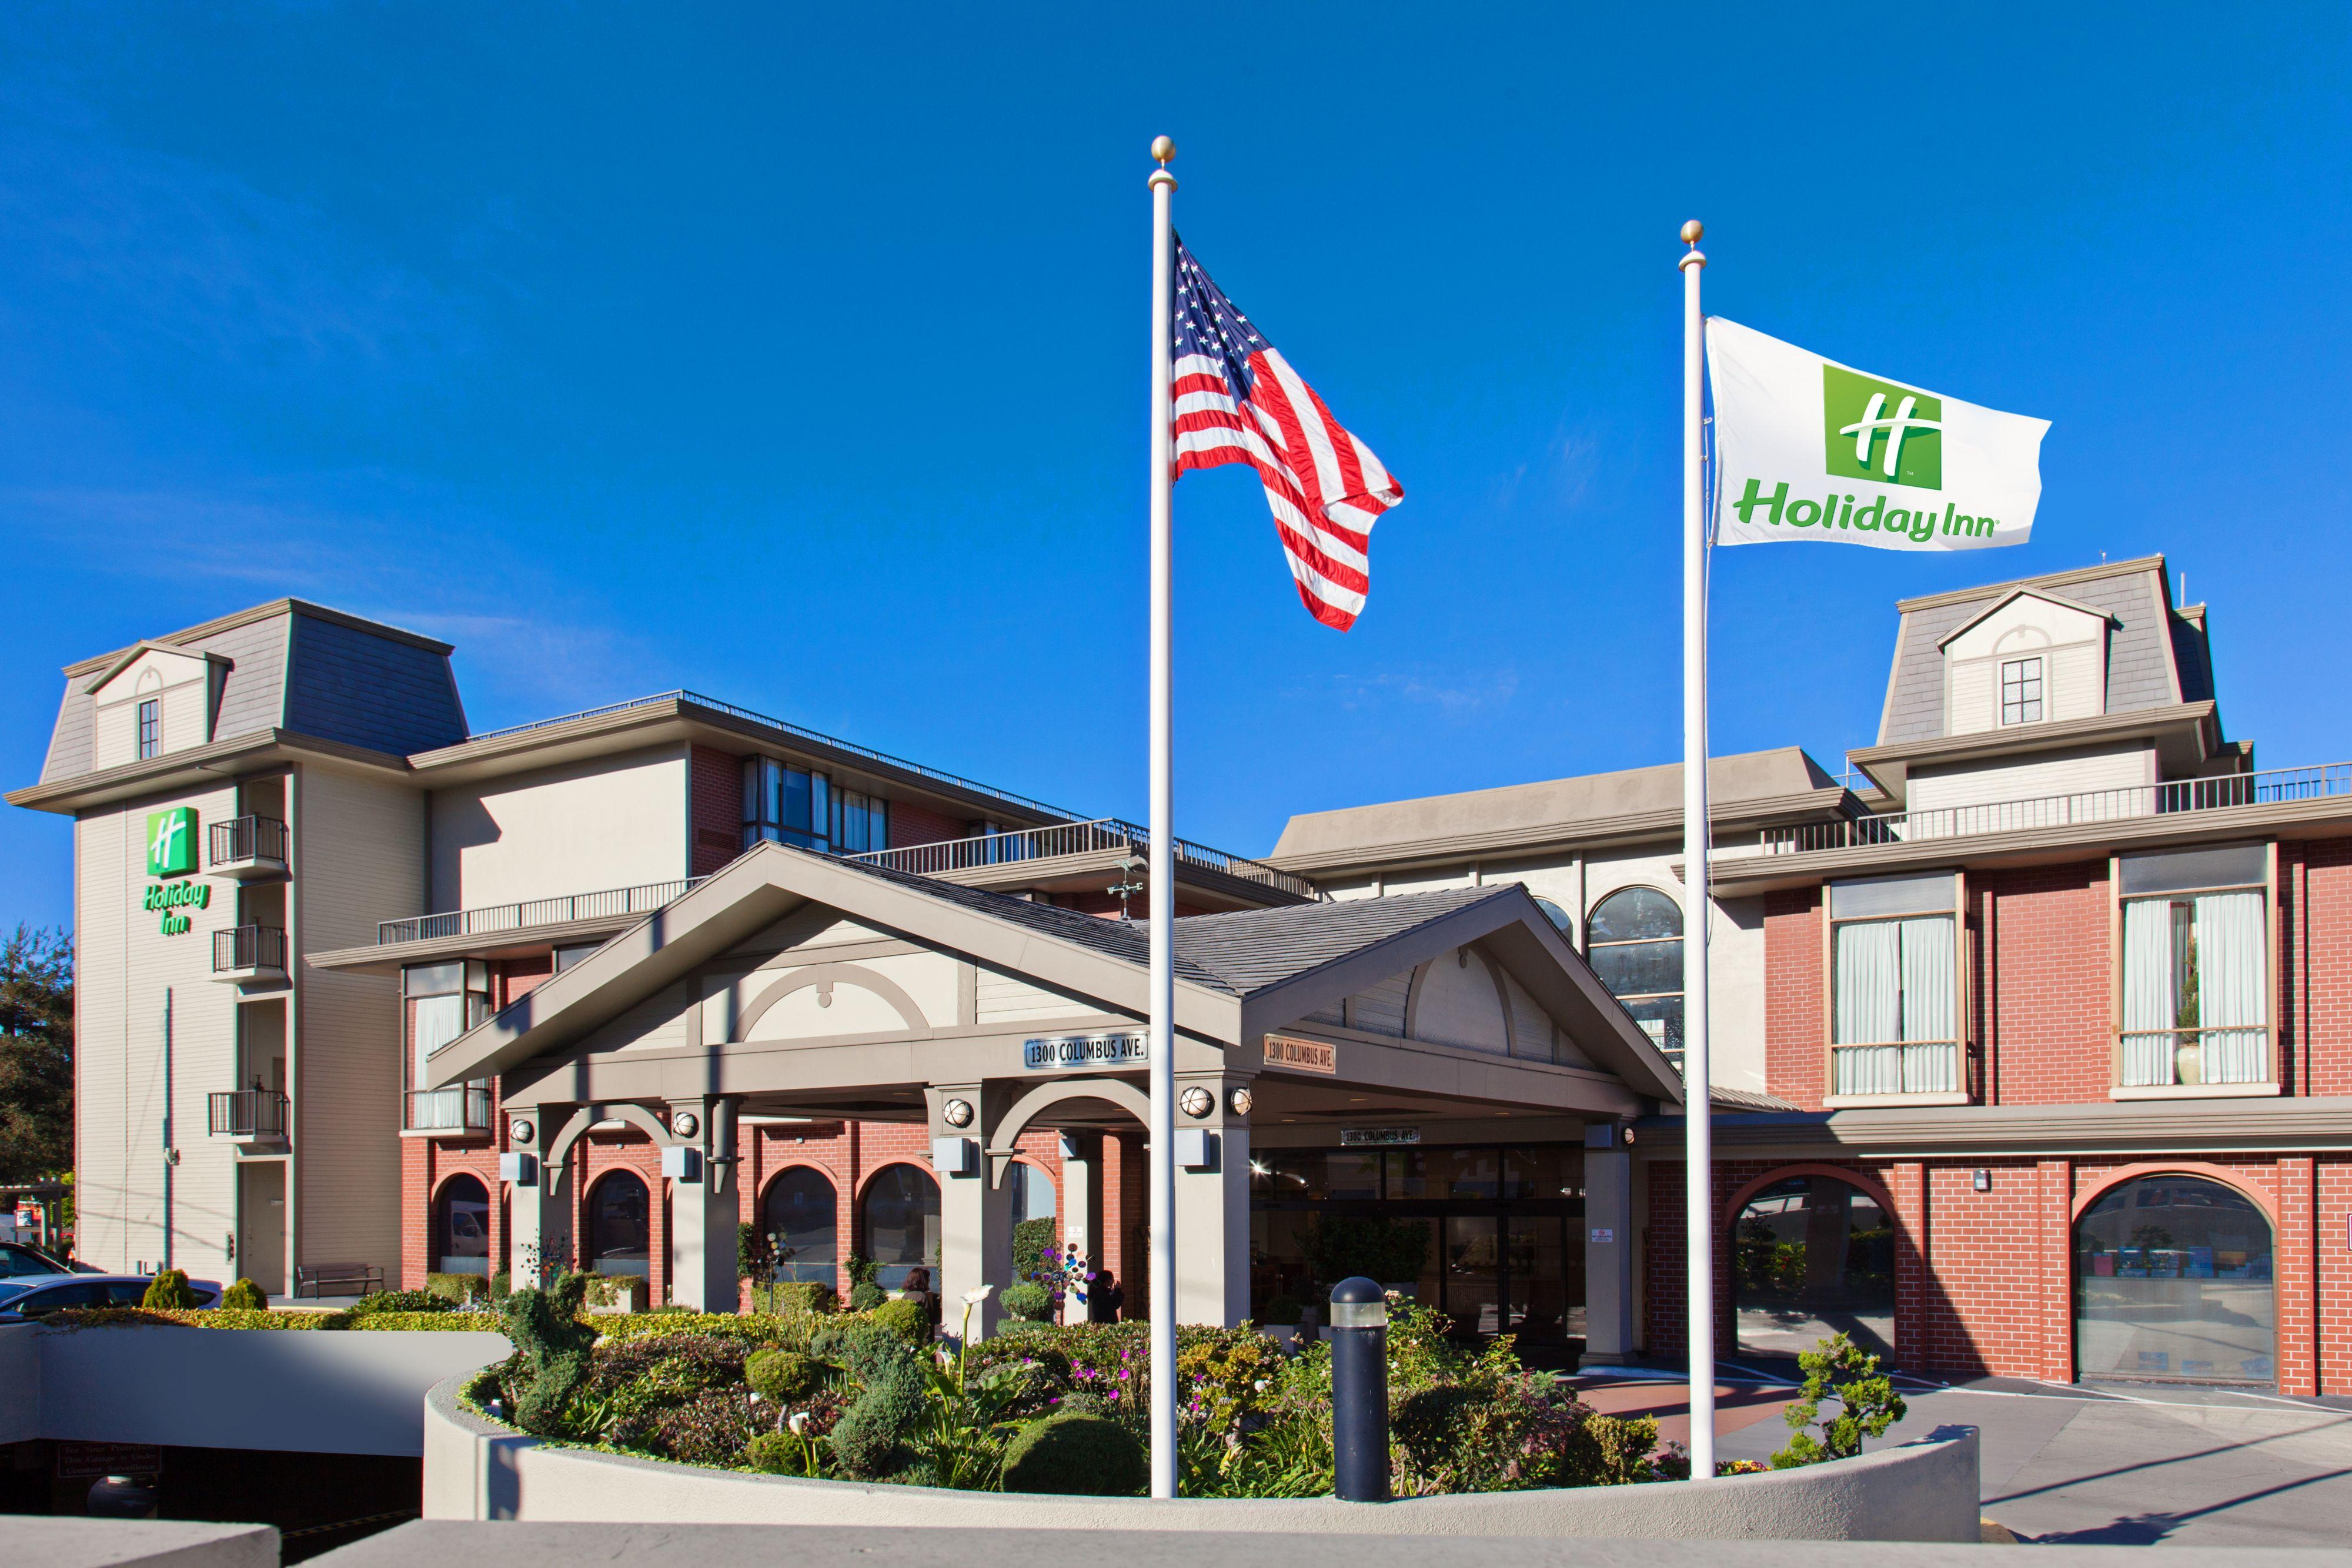 Holiday Inn San Francisco-Fishermans Wharf image 4